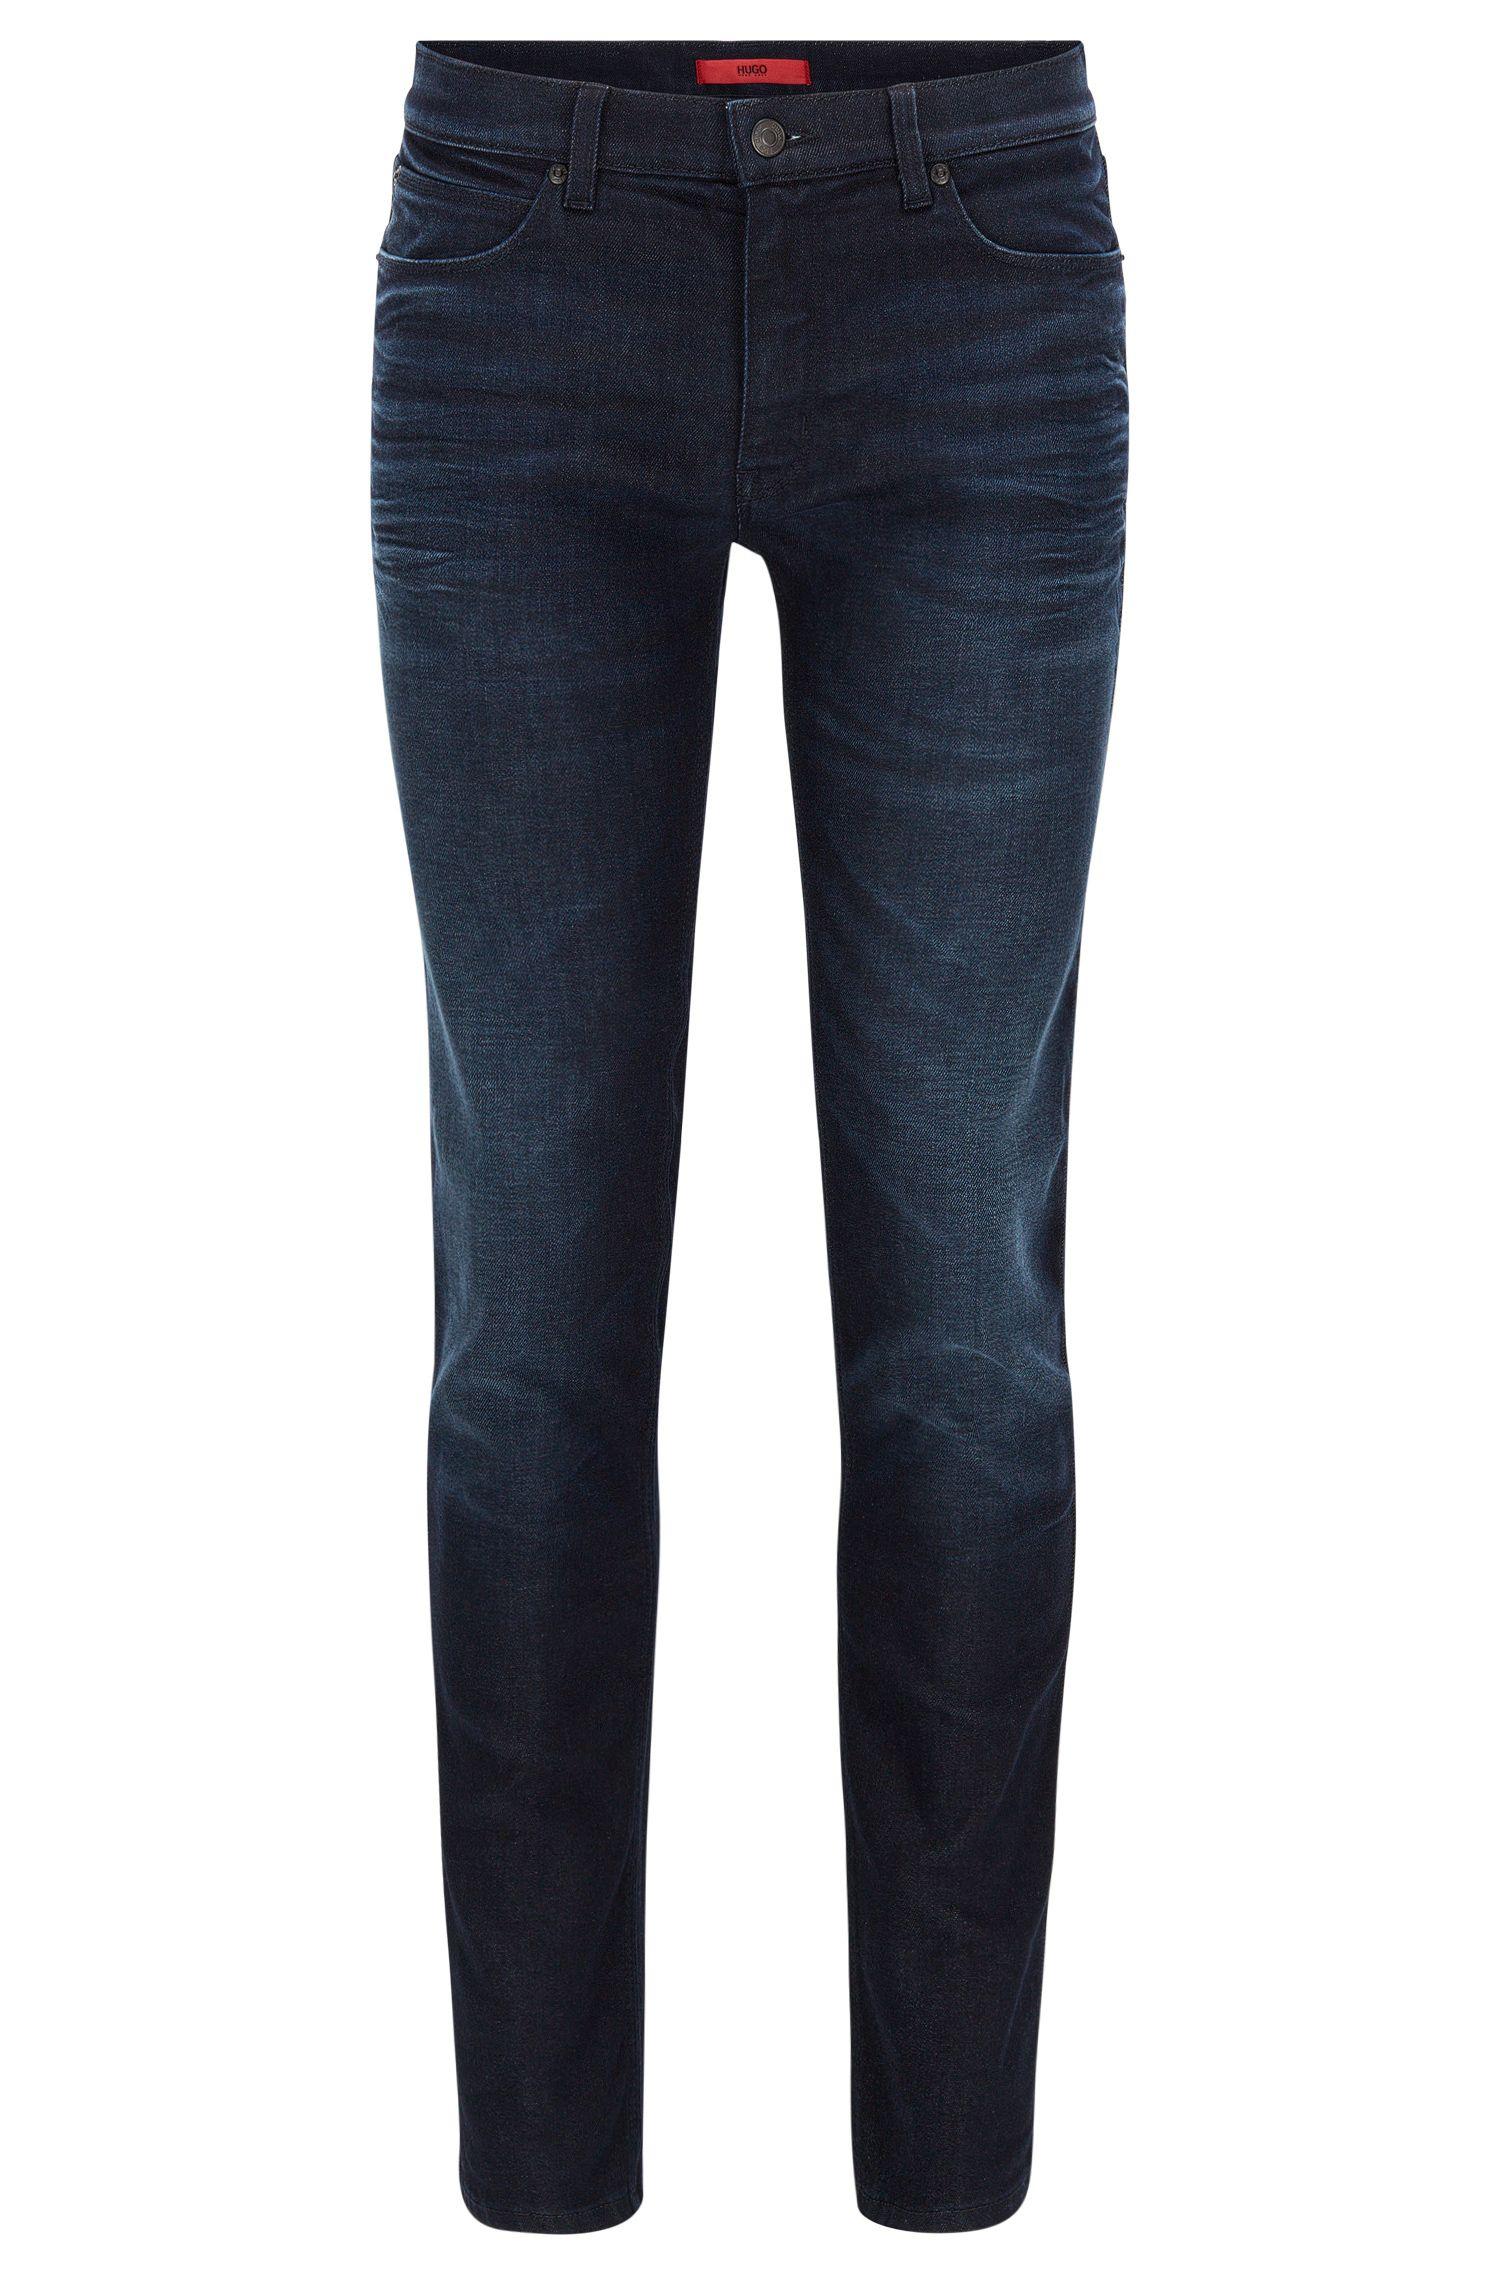 Slim-Fit Jeans aus dunklem Stretch-Denim